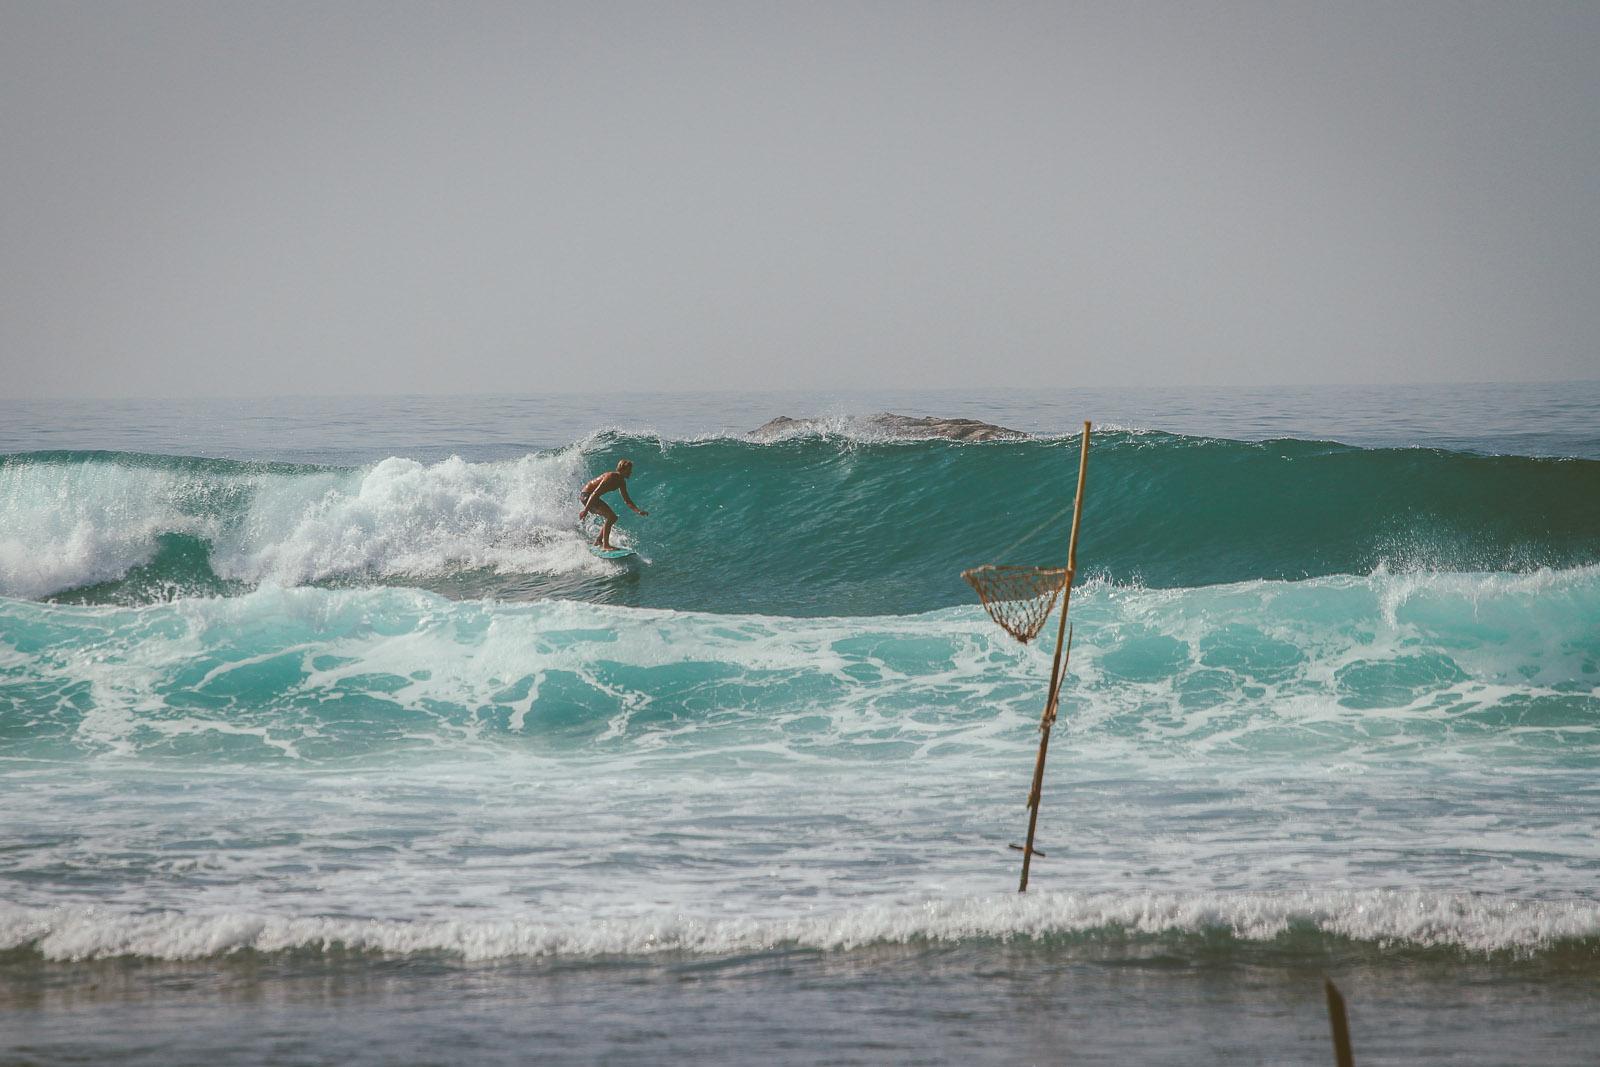 Sri Lanka-Ahangama-Kabalana-The rock-Surf-Barrel-Big swell-Midigama-Surfing-travel-blog-IMG_9298